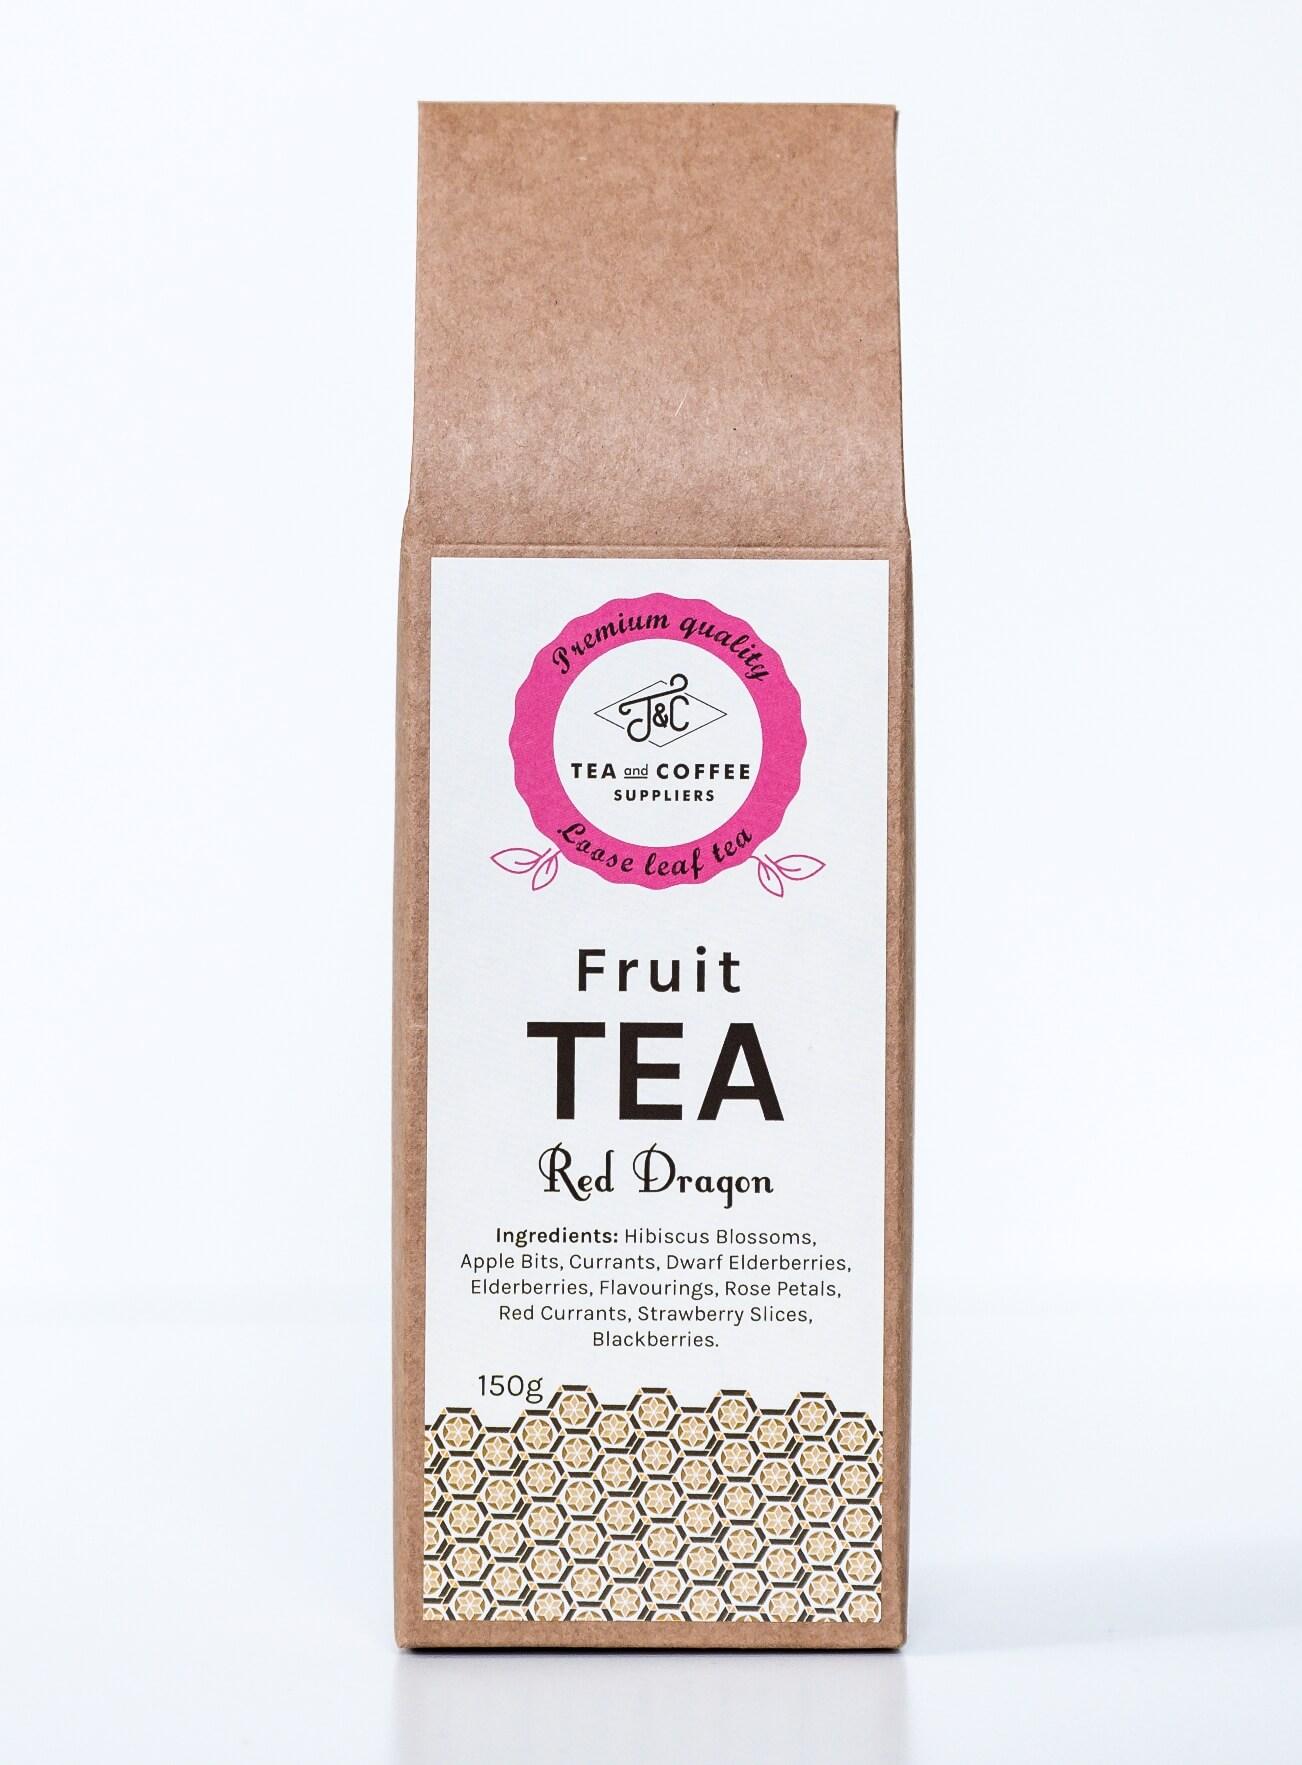 T&C 'Red Dragon' Fruit Tea